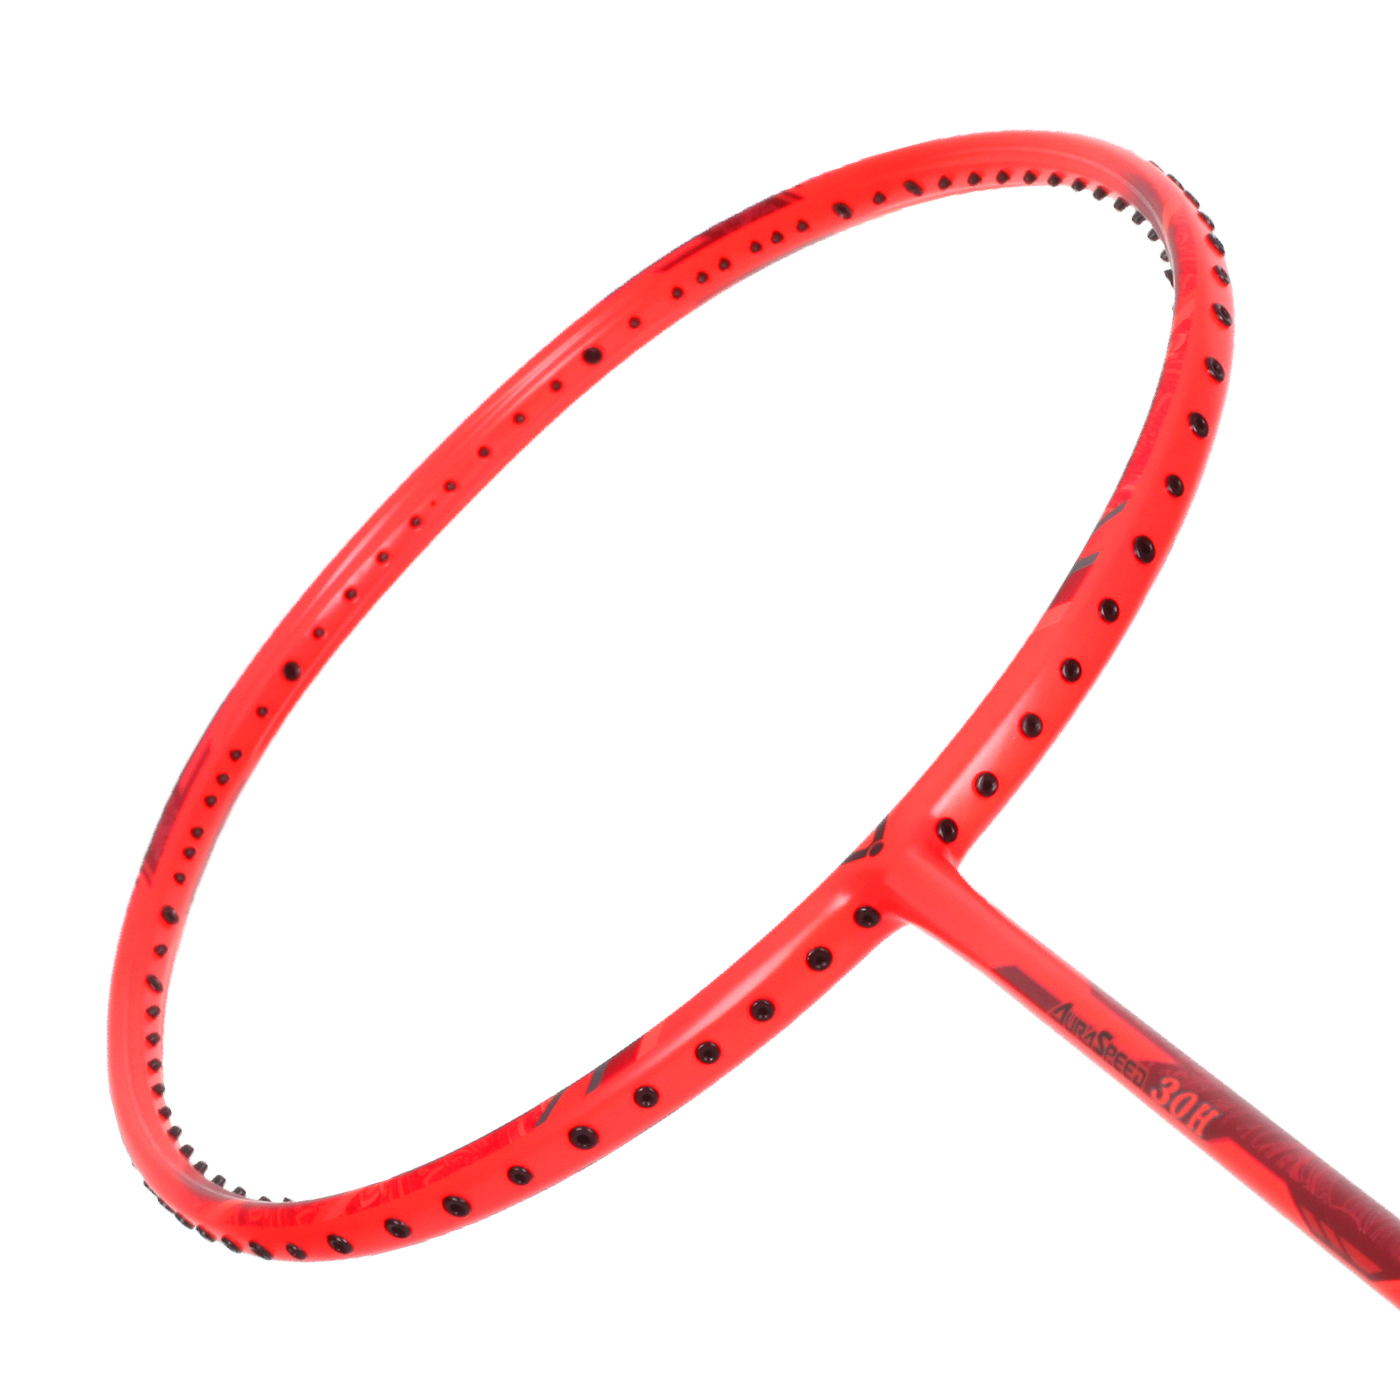 VICTOR 速度穿線拍-4U ARS-30H-D - 橘紅黑